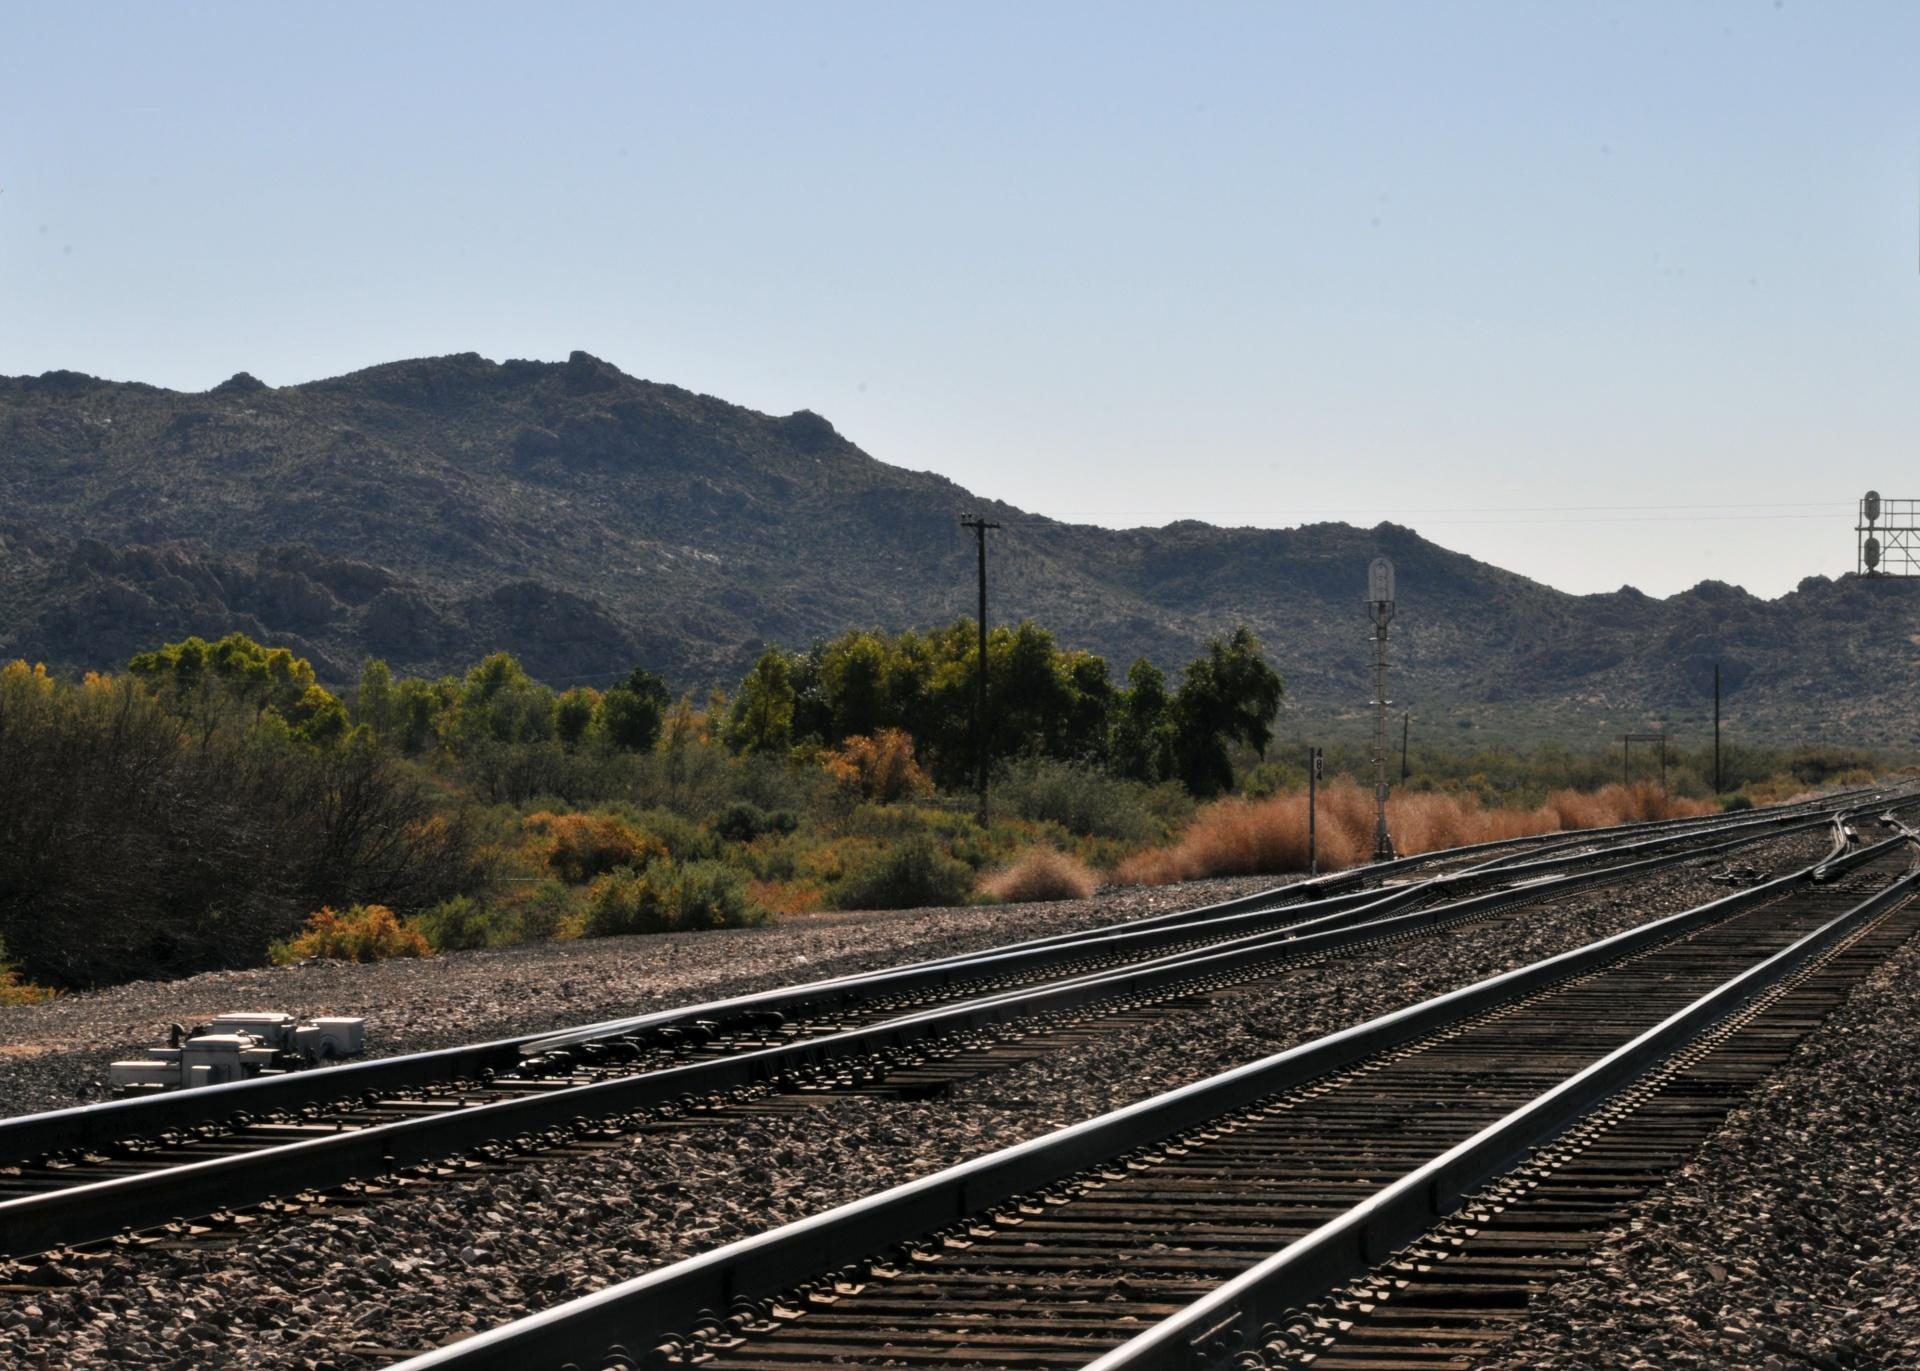 infinity-train-tracks